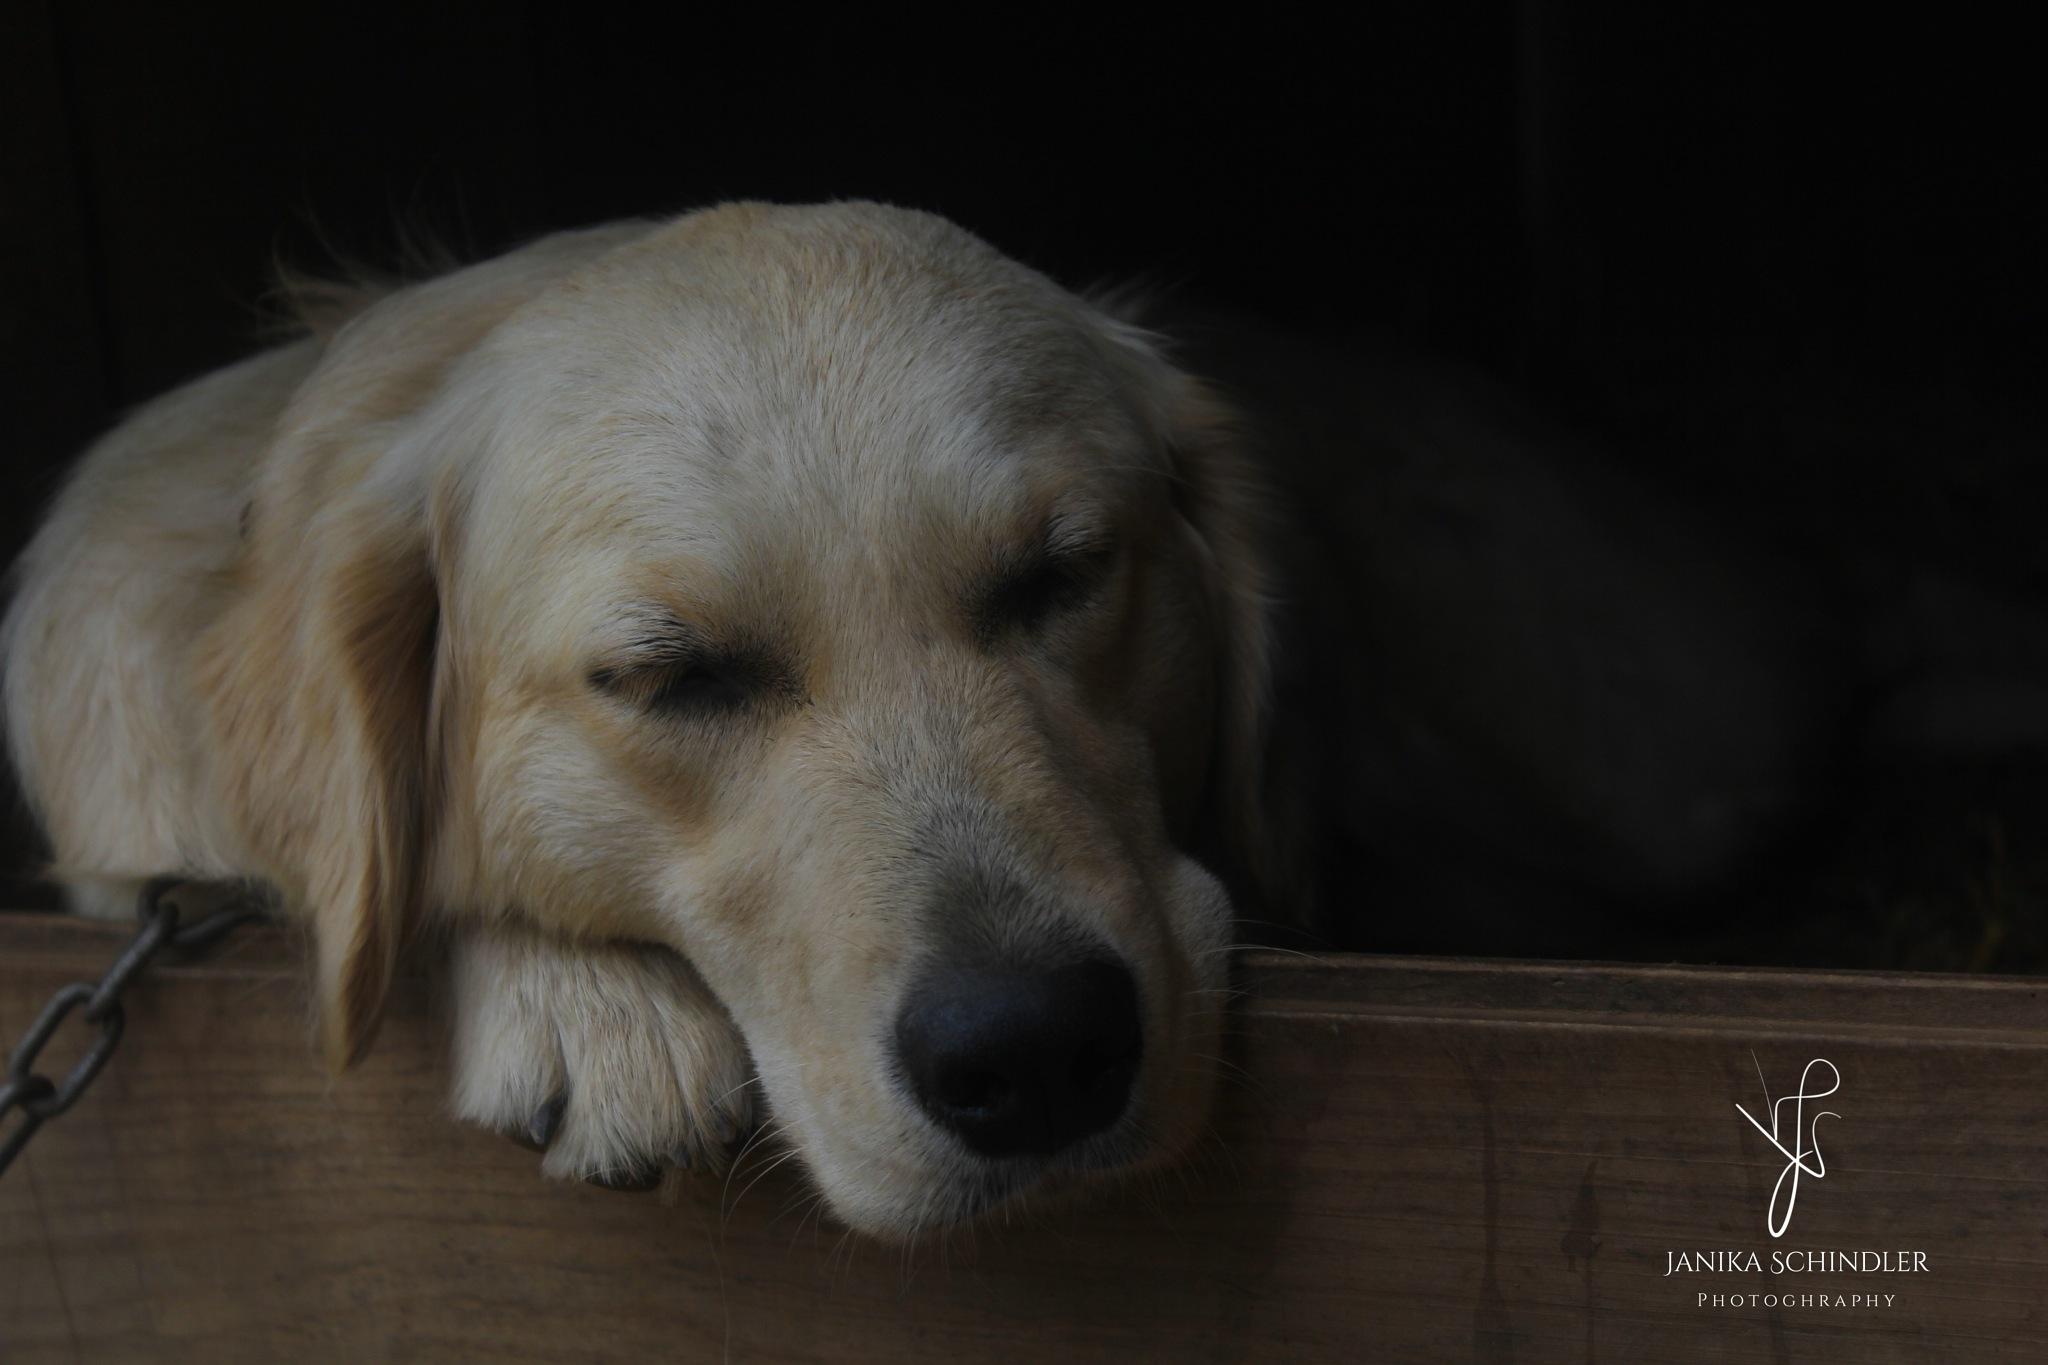 My sisters dog sleeping  by Janika Schindler